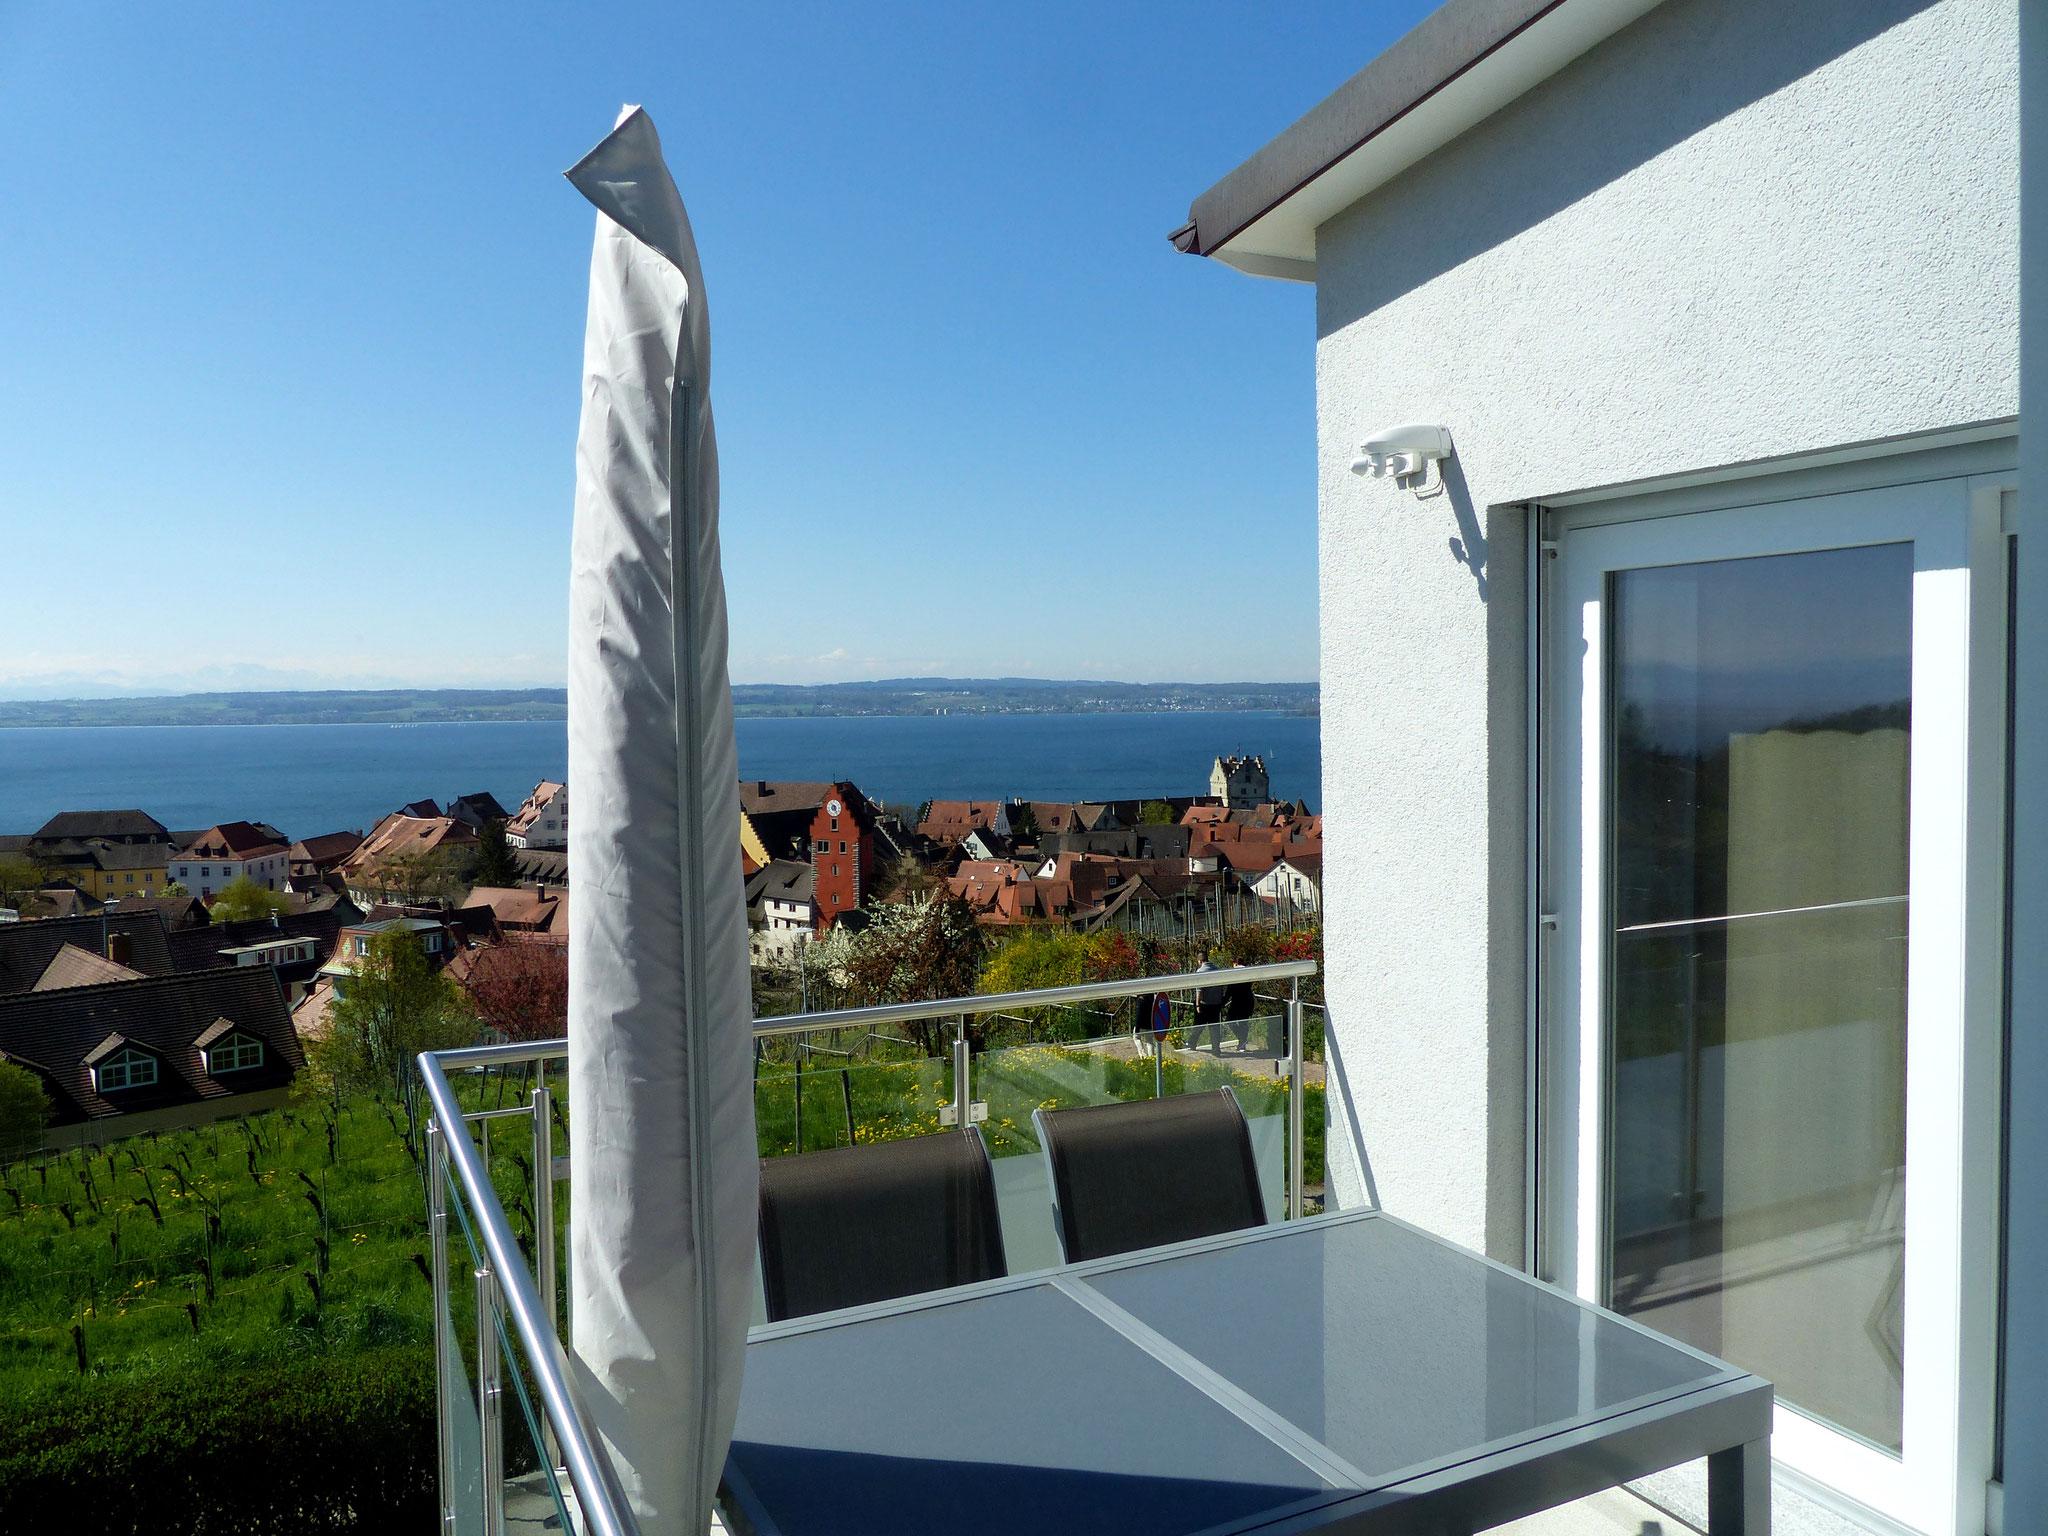 sonniger Balkon mit Seeblick